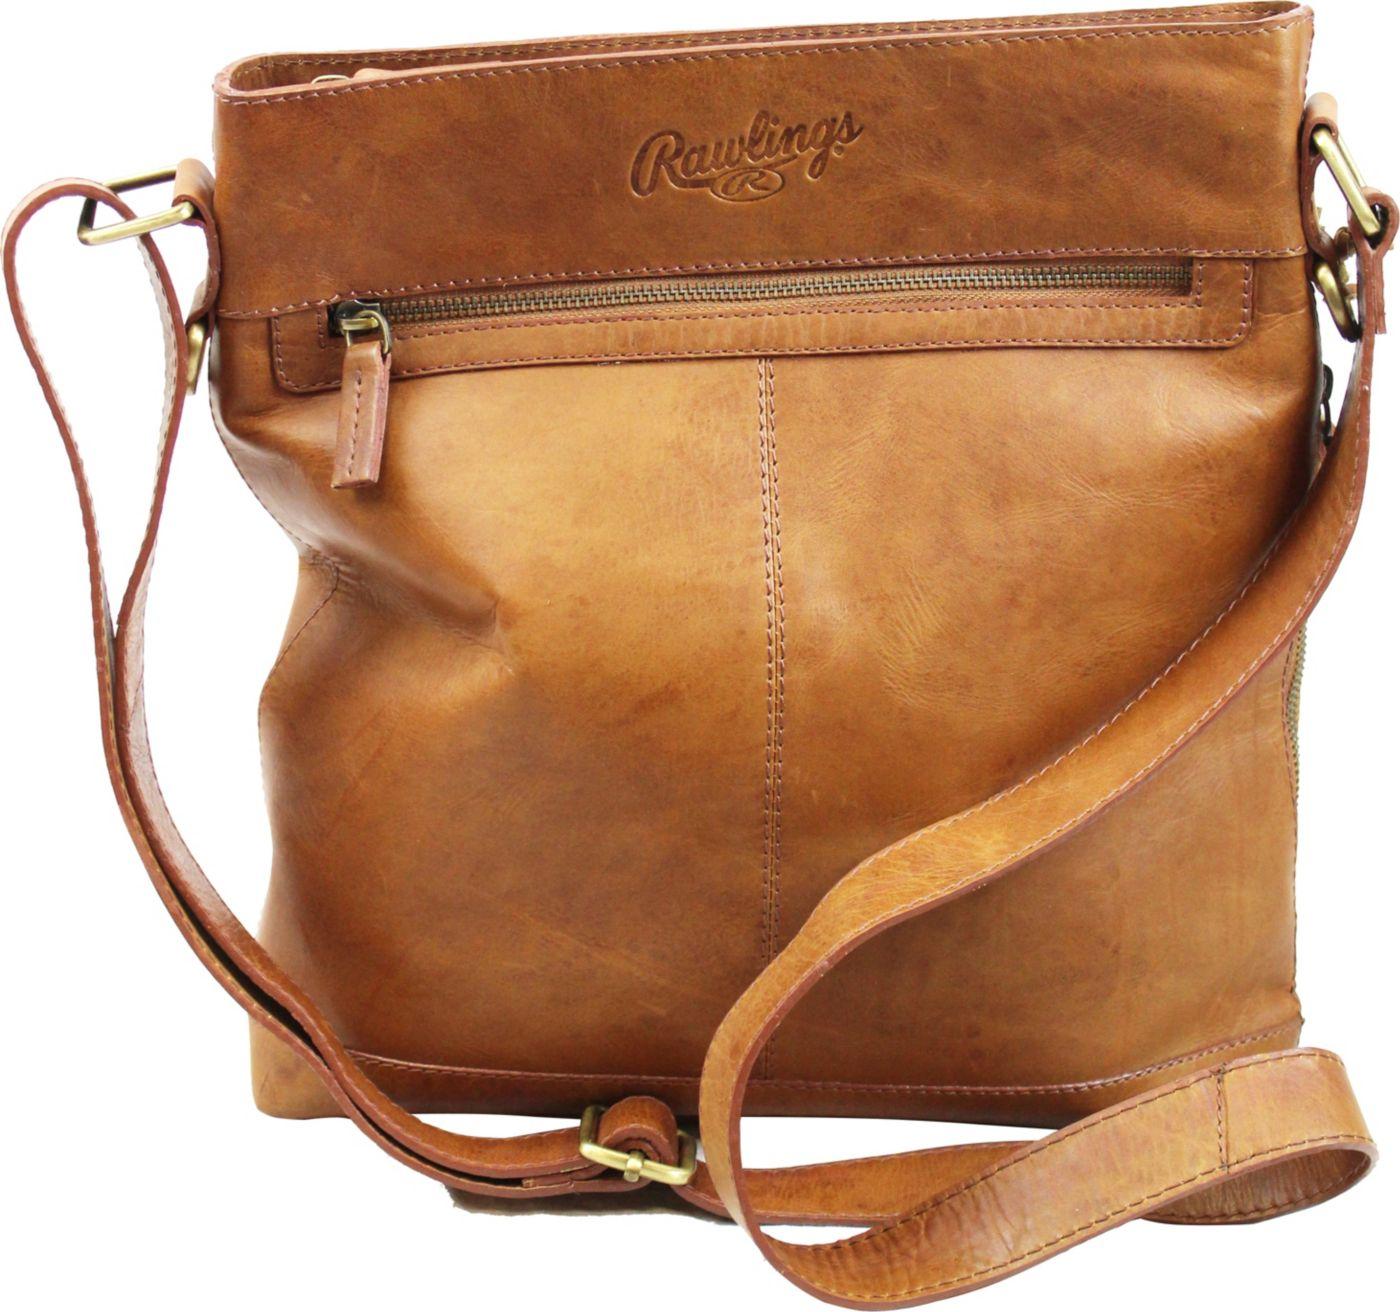 Rawlings Large Leather Crossbody Bag